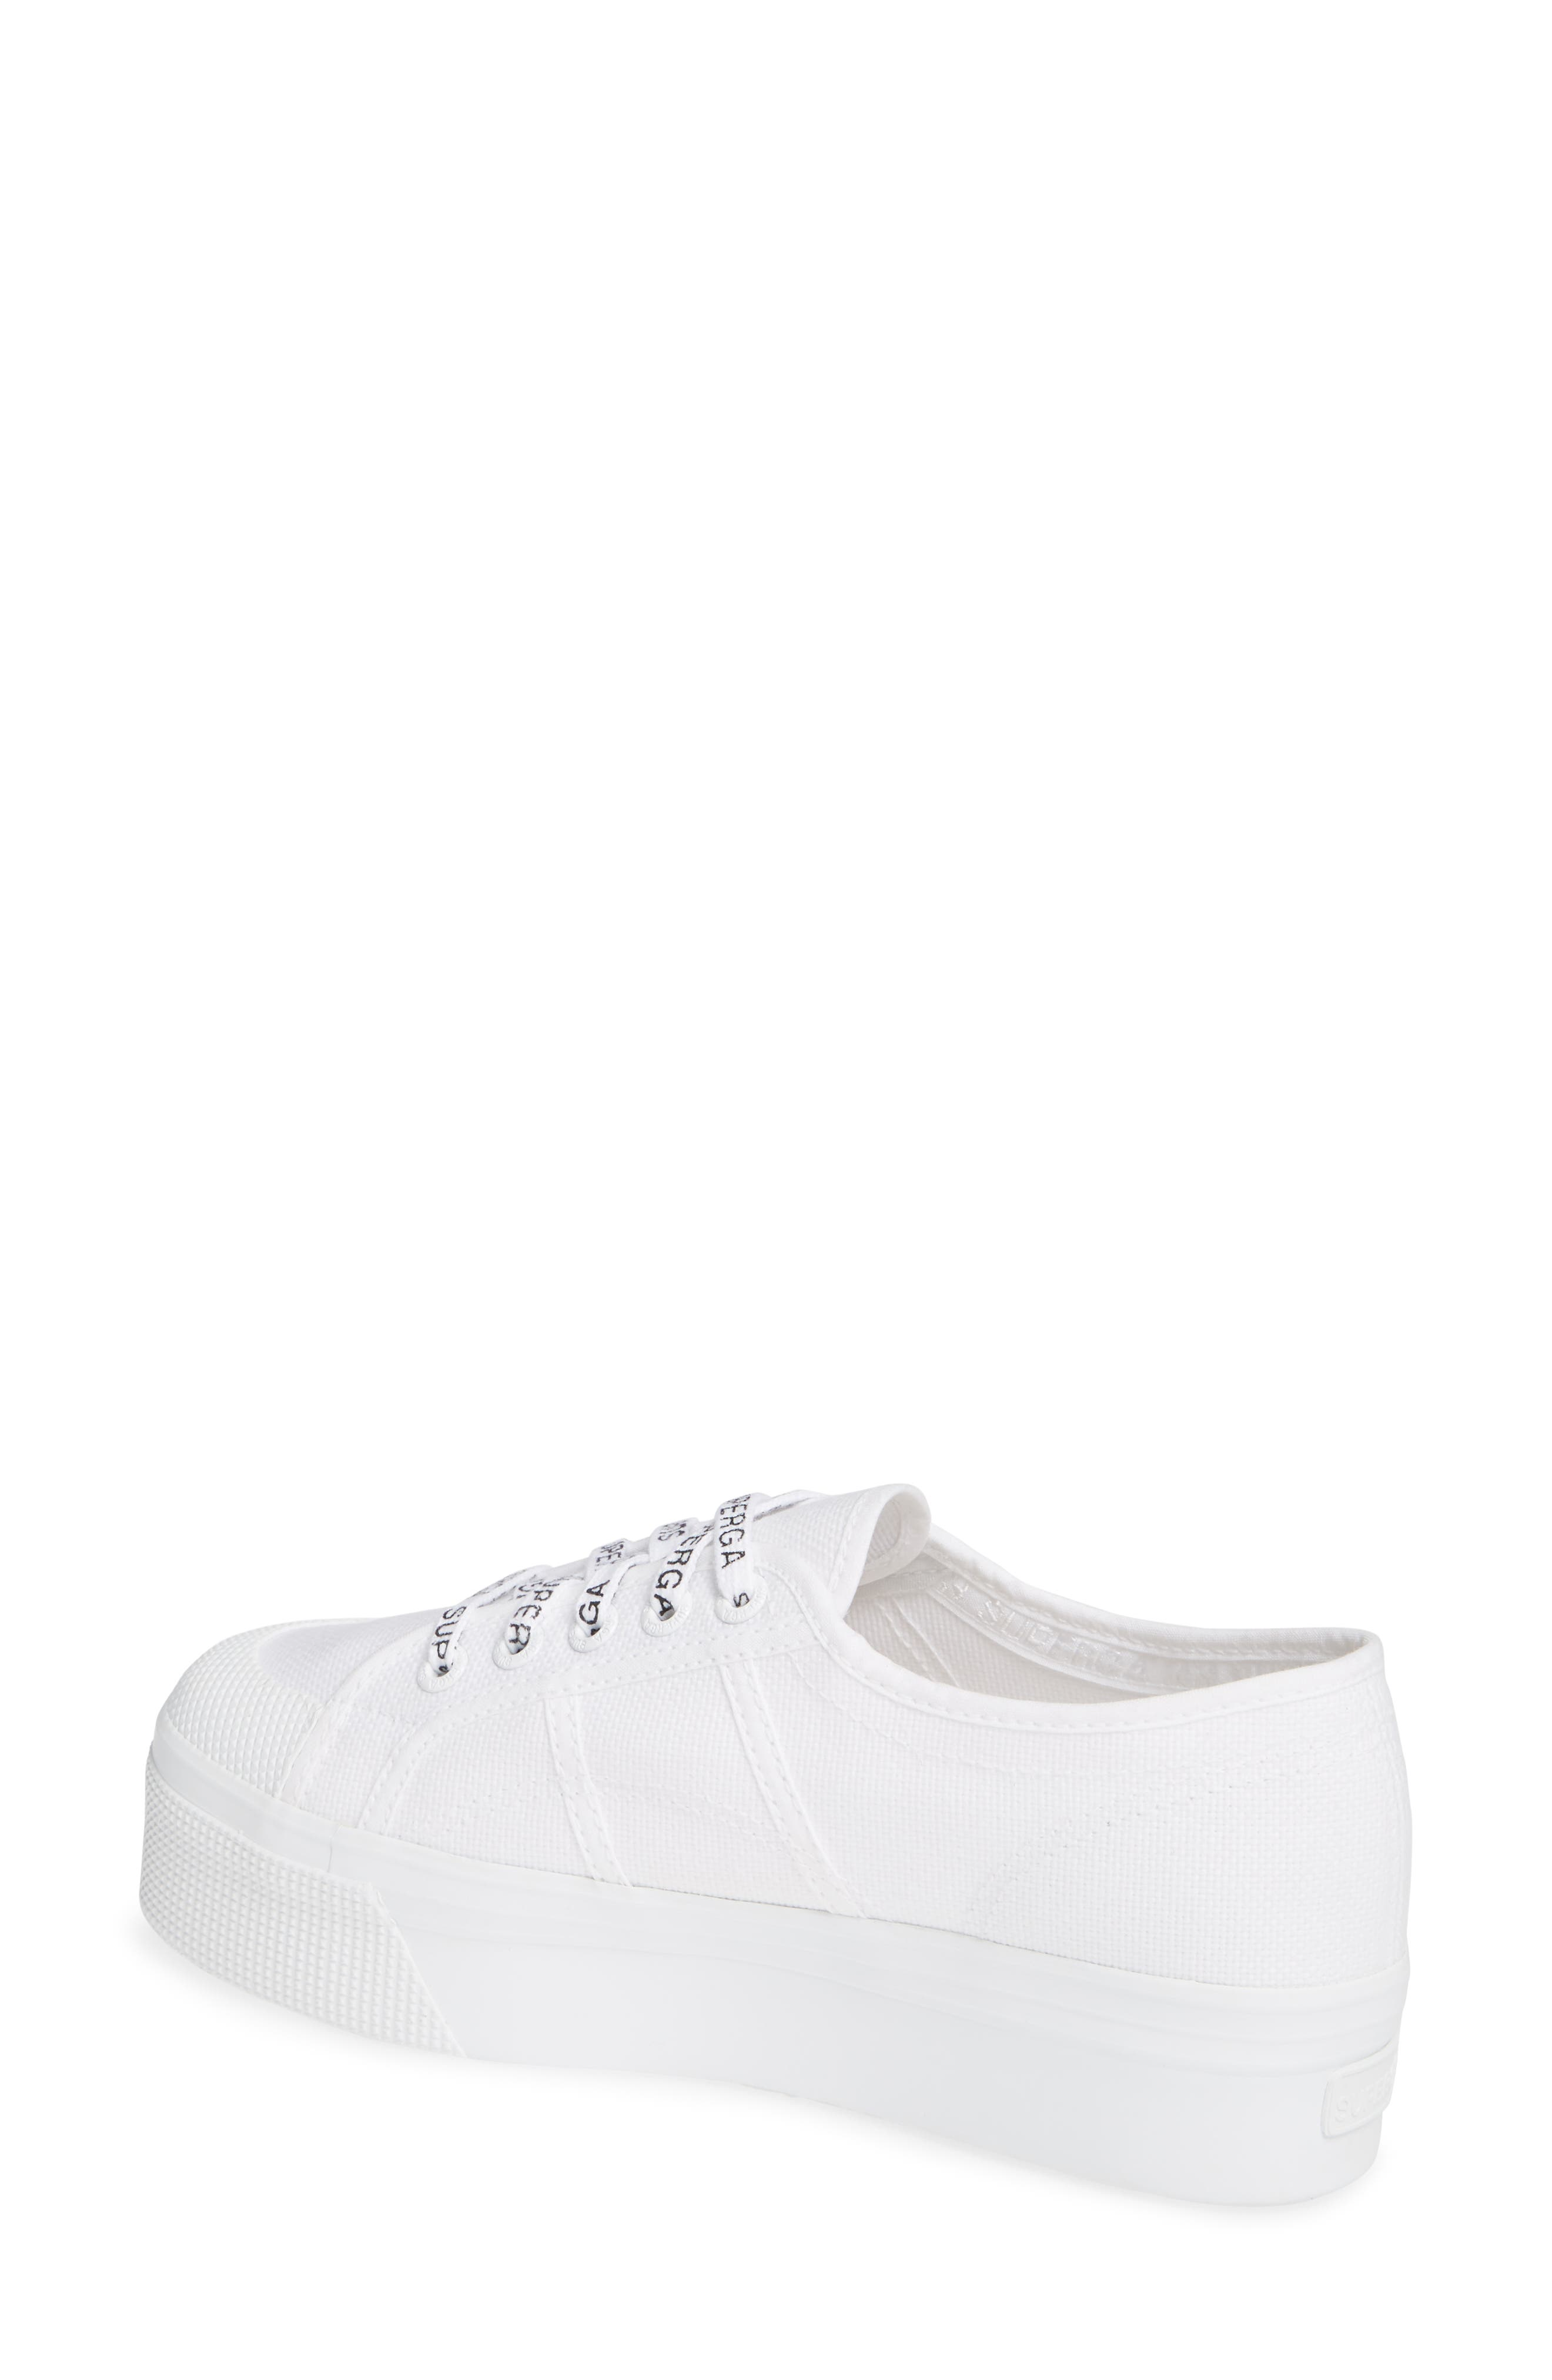 2405 Cotu Platform Sneaker,                             Alternate thumbnail 2, color,                             WHITE/ WHITE